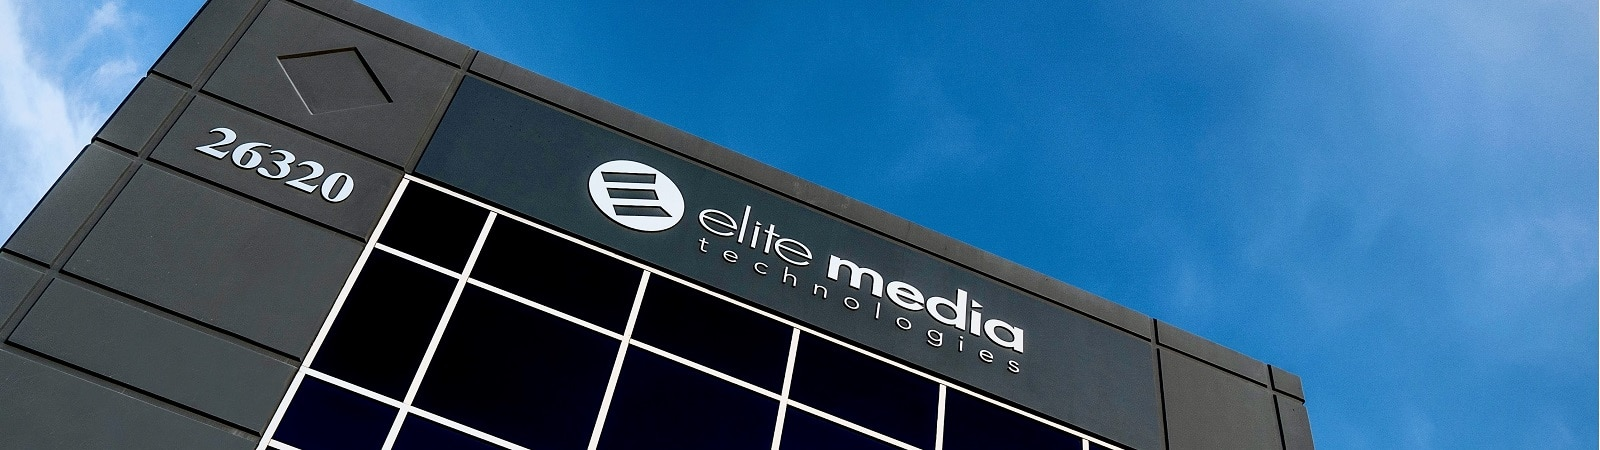 Elite Media external view of corporate building.